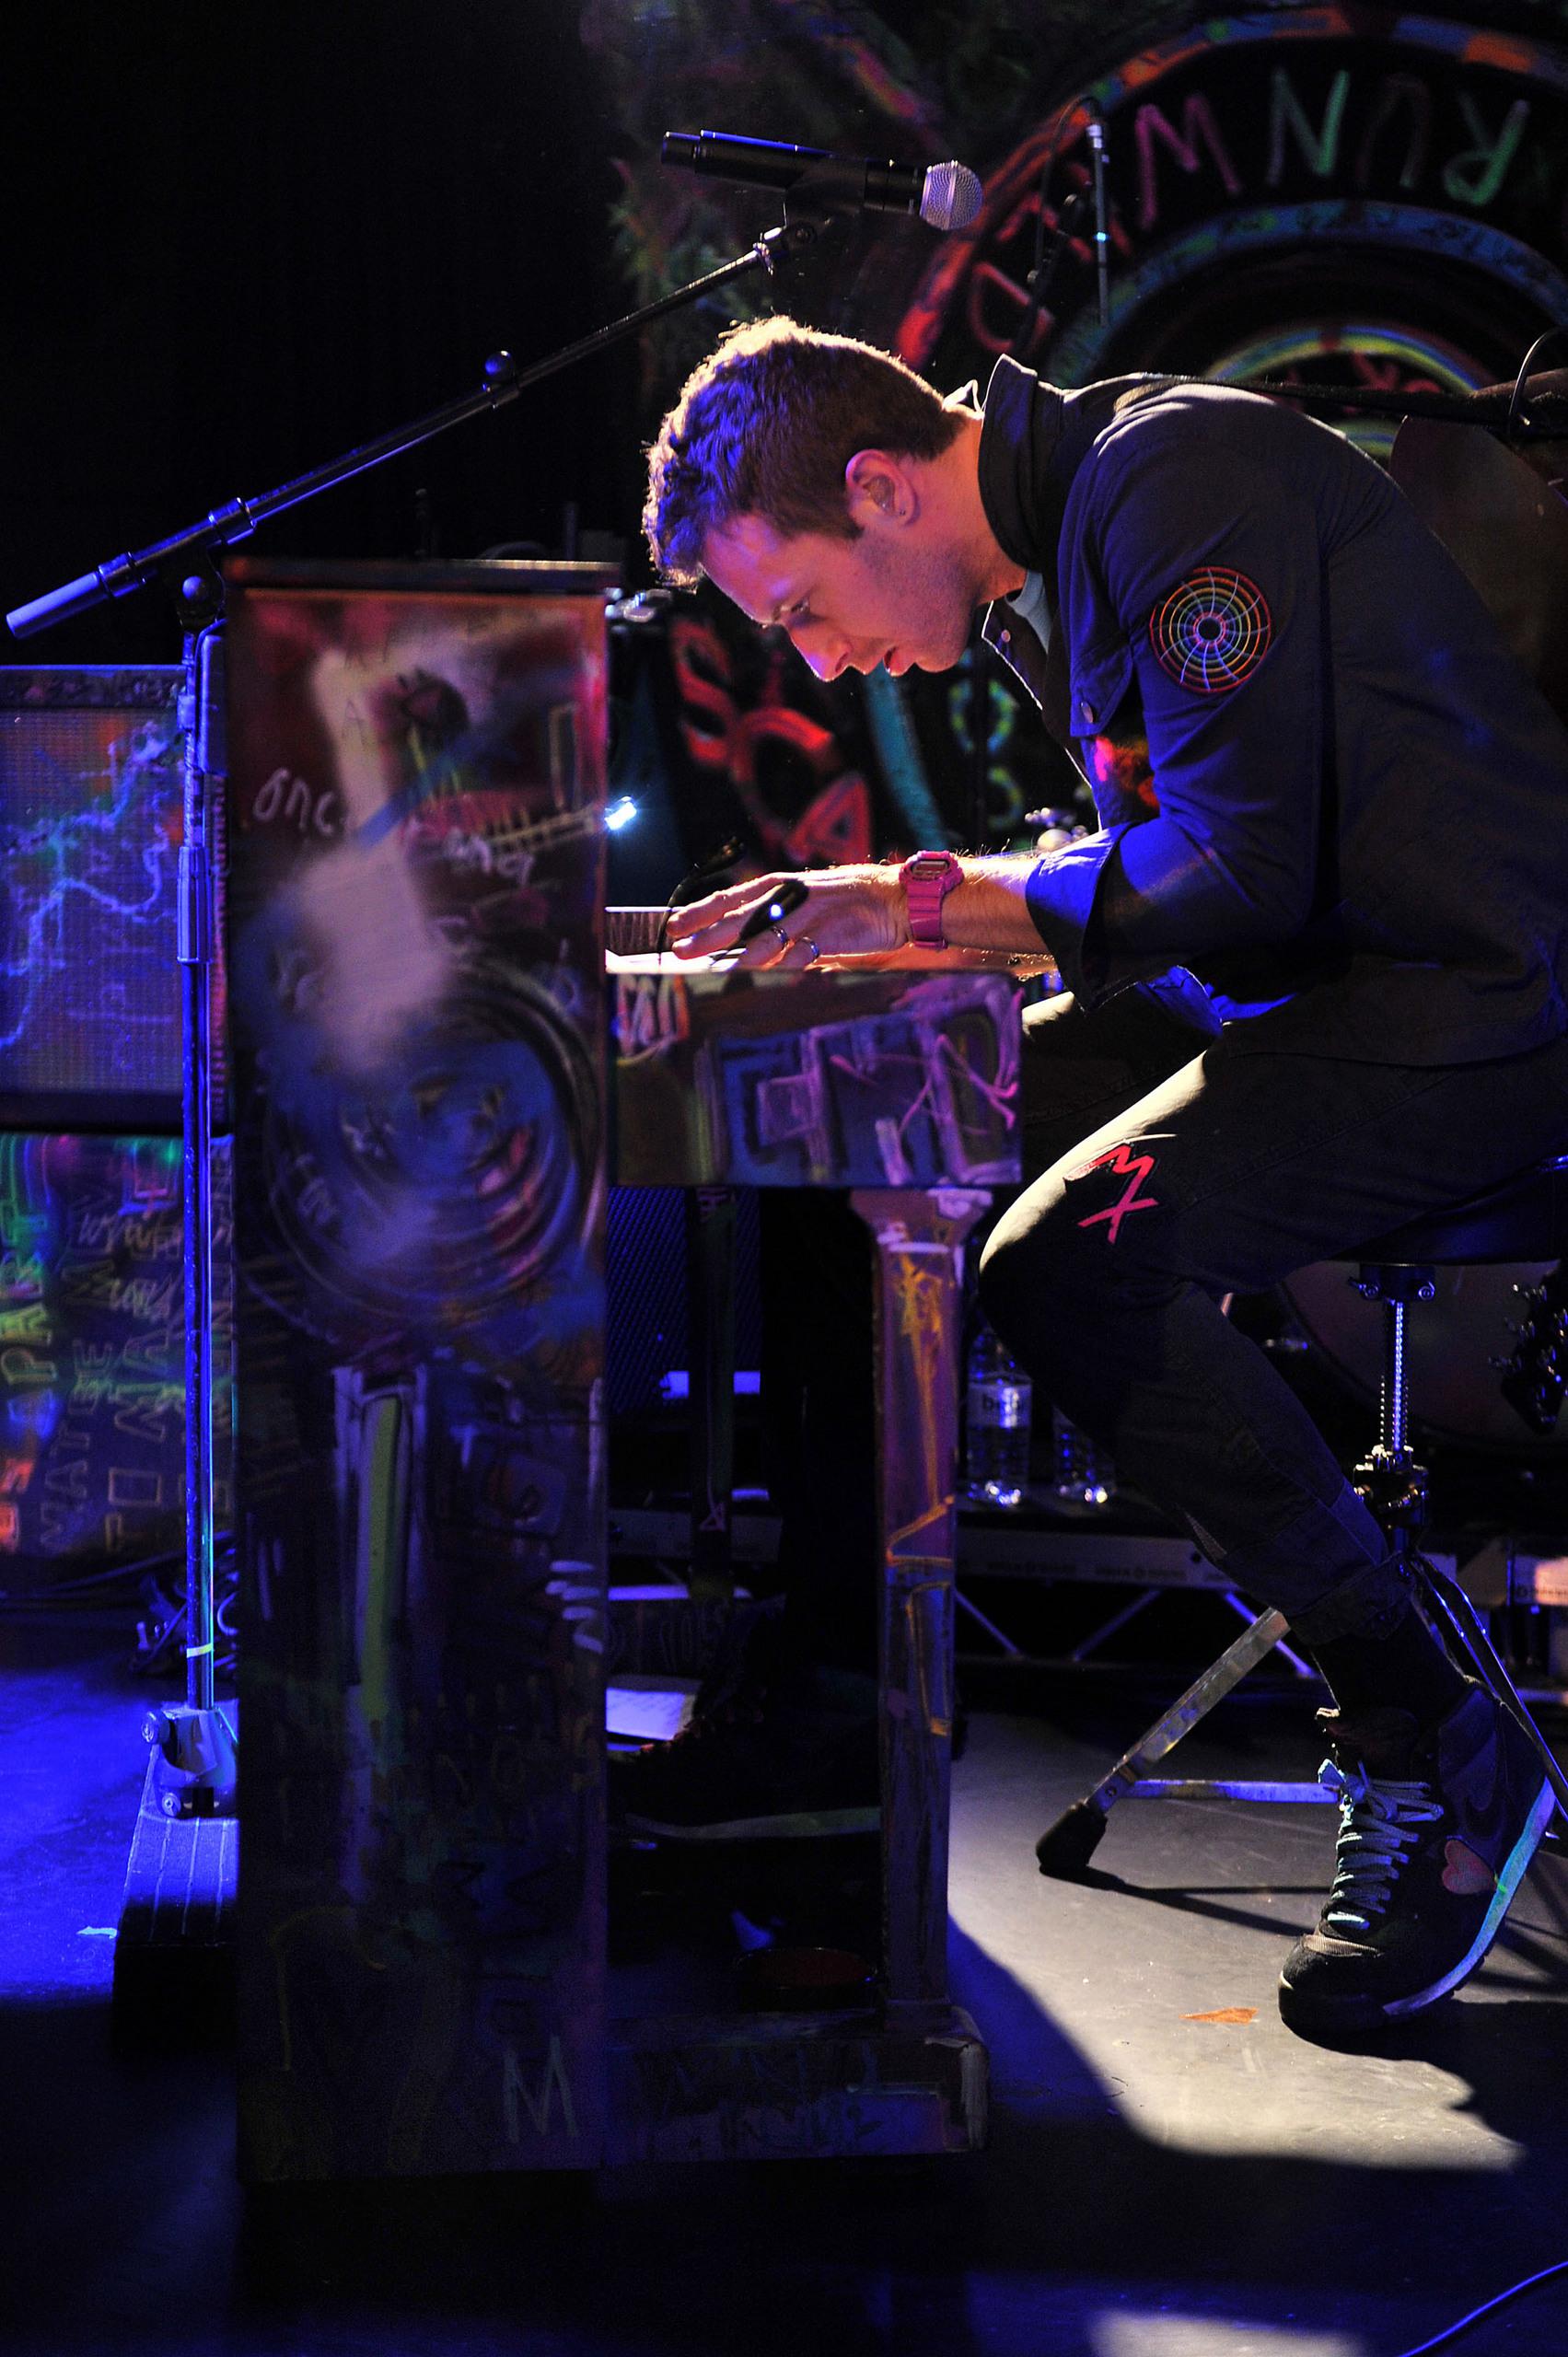 On Stage: BBC Radio 2 [December 6, 2011]